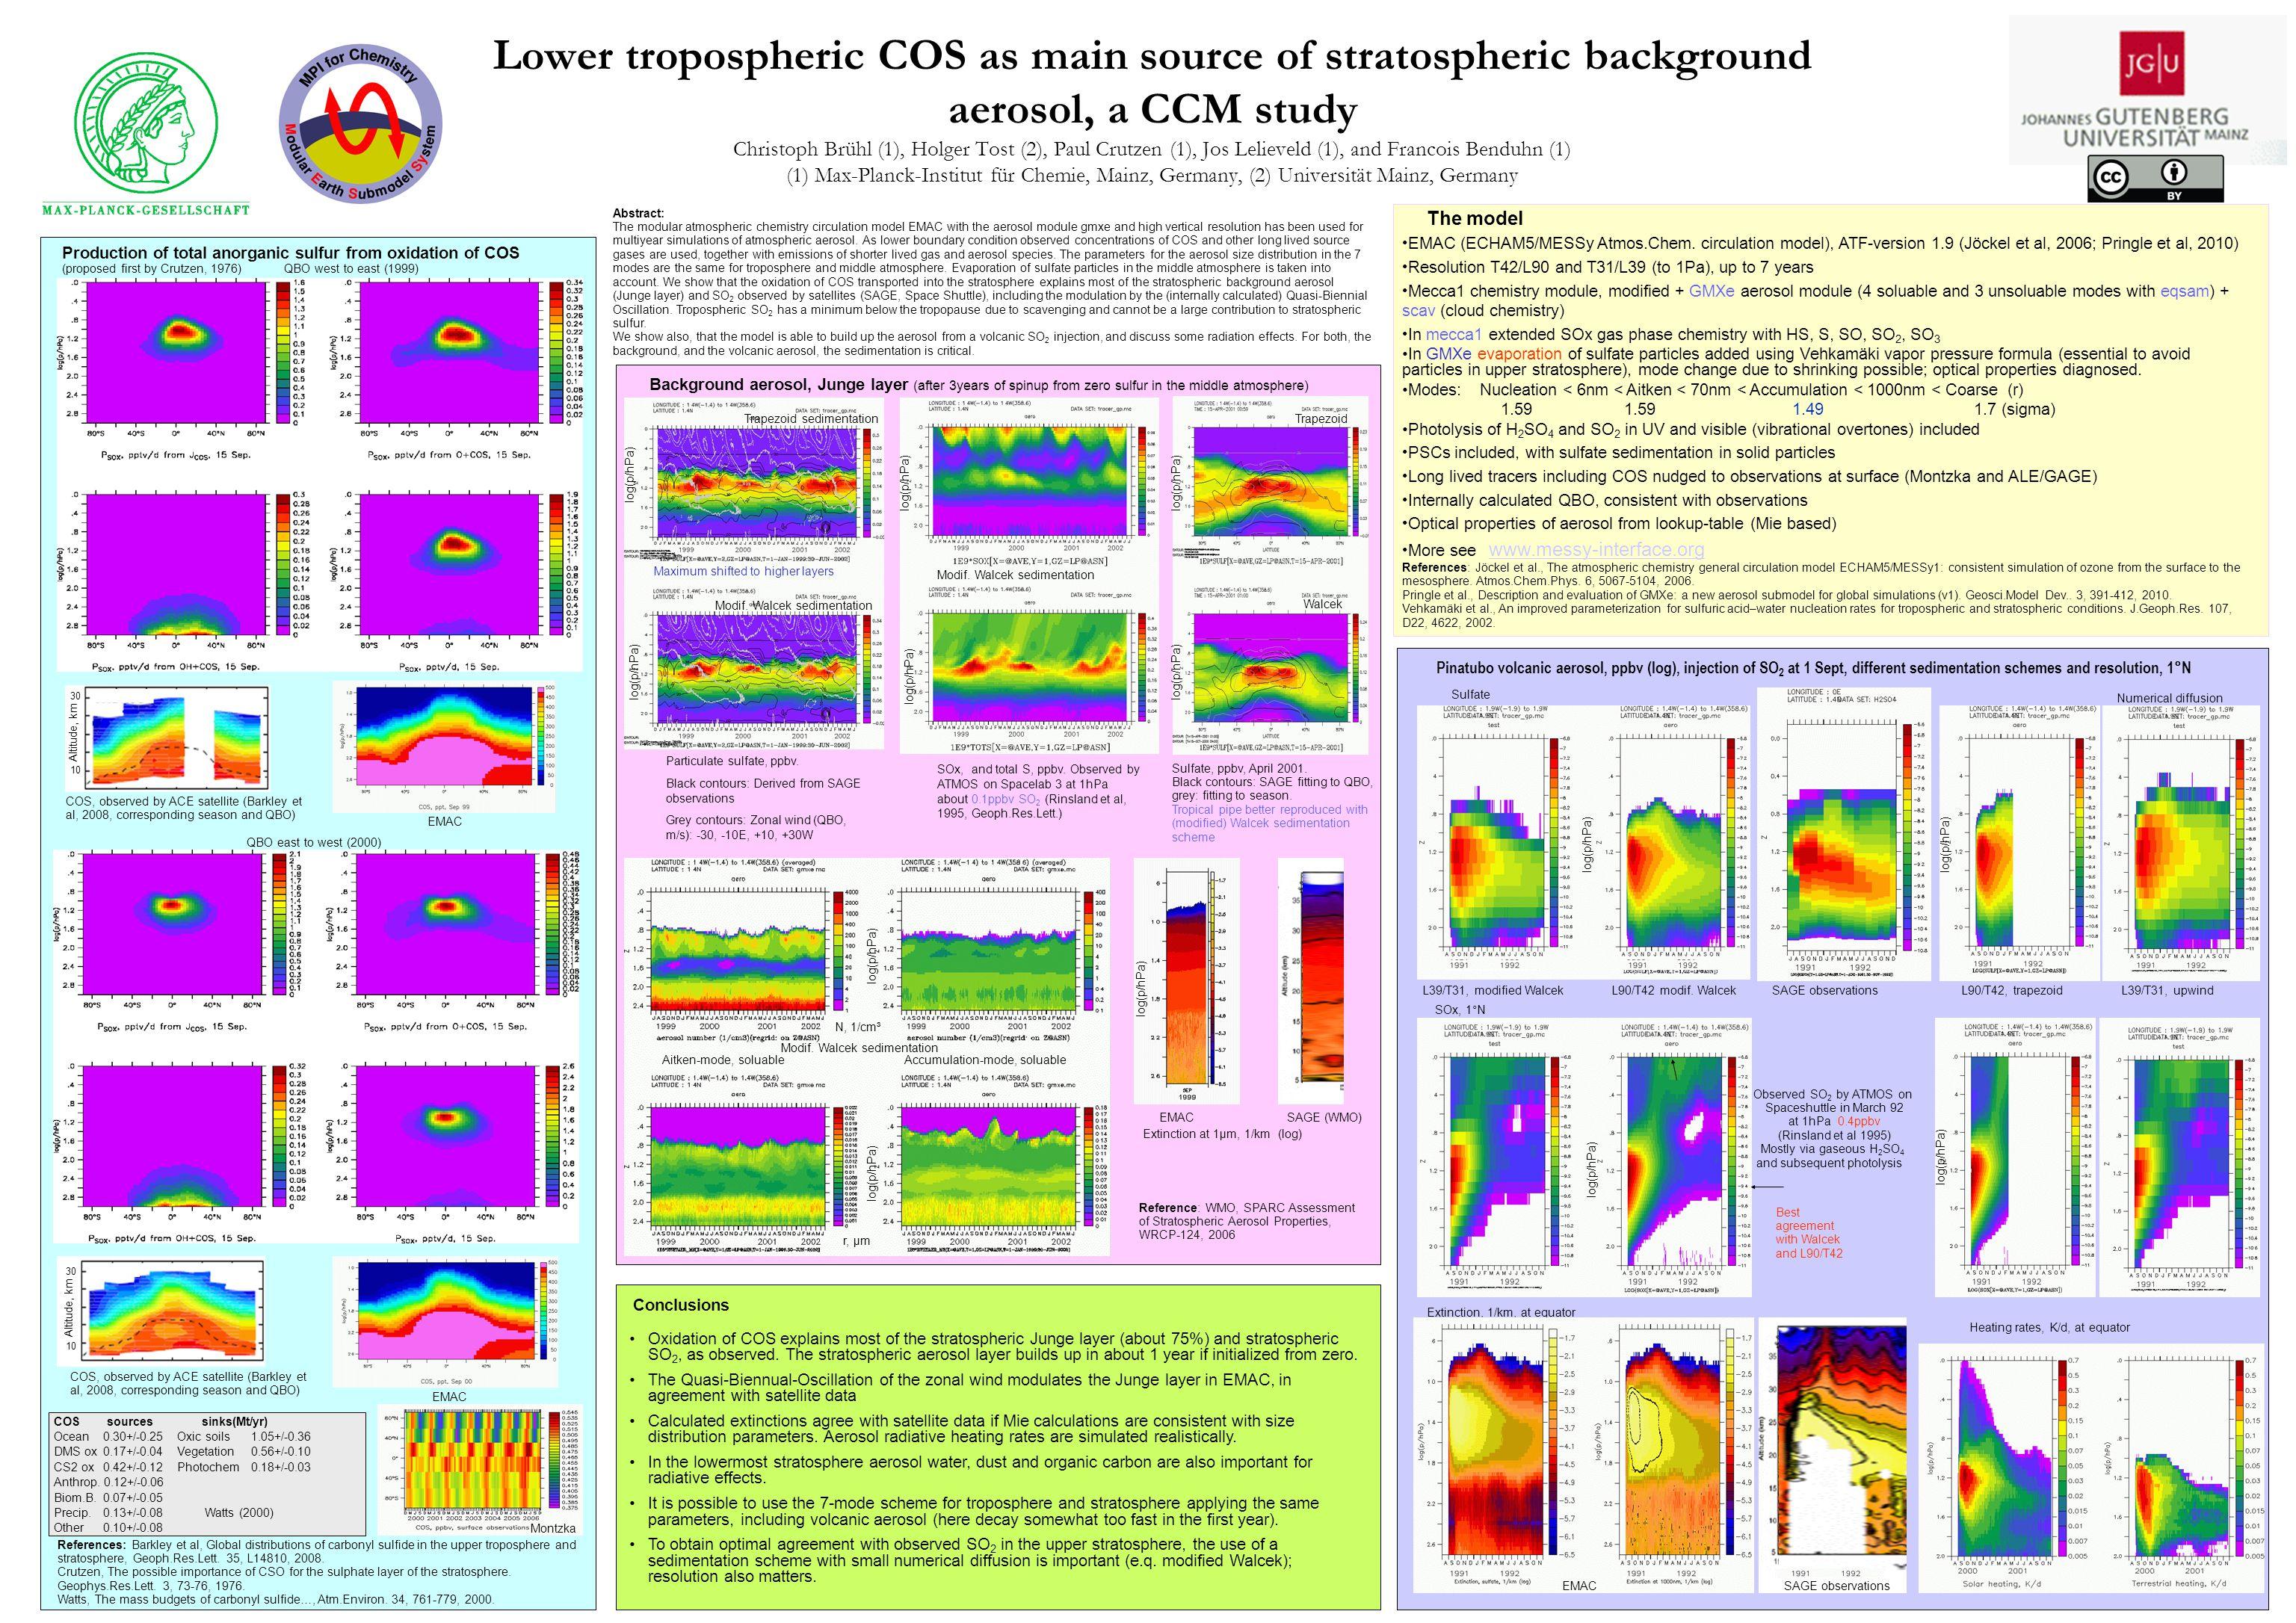 Lower tropospheric COS as main source of stratospheric background aerosol, a CCM study Christoph Brühl (1), Holger Tost (2), Paul Crutzen (1), Jos Lel